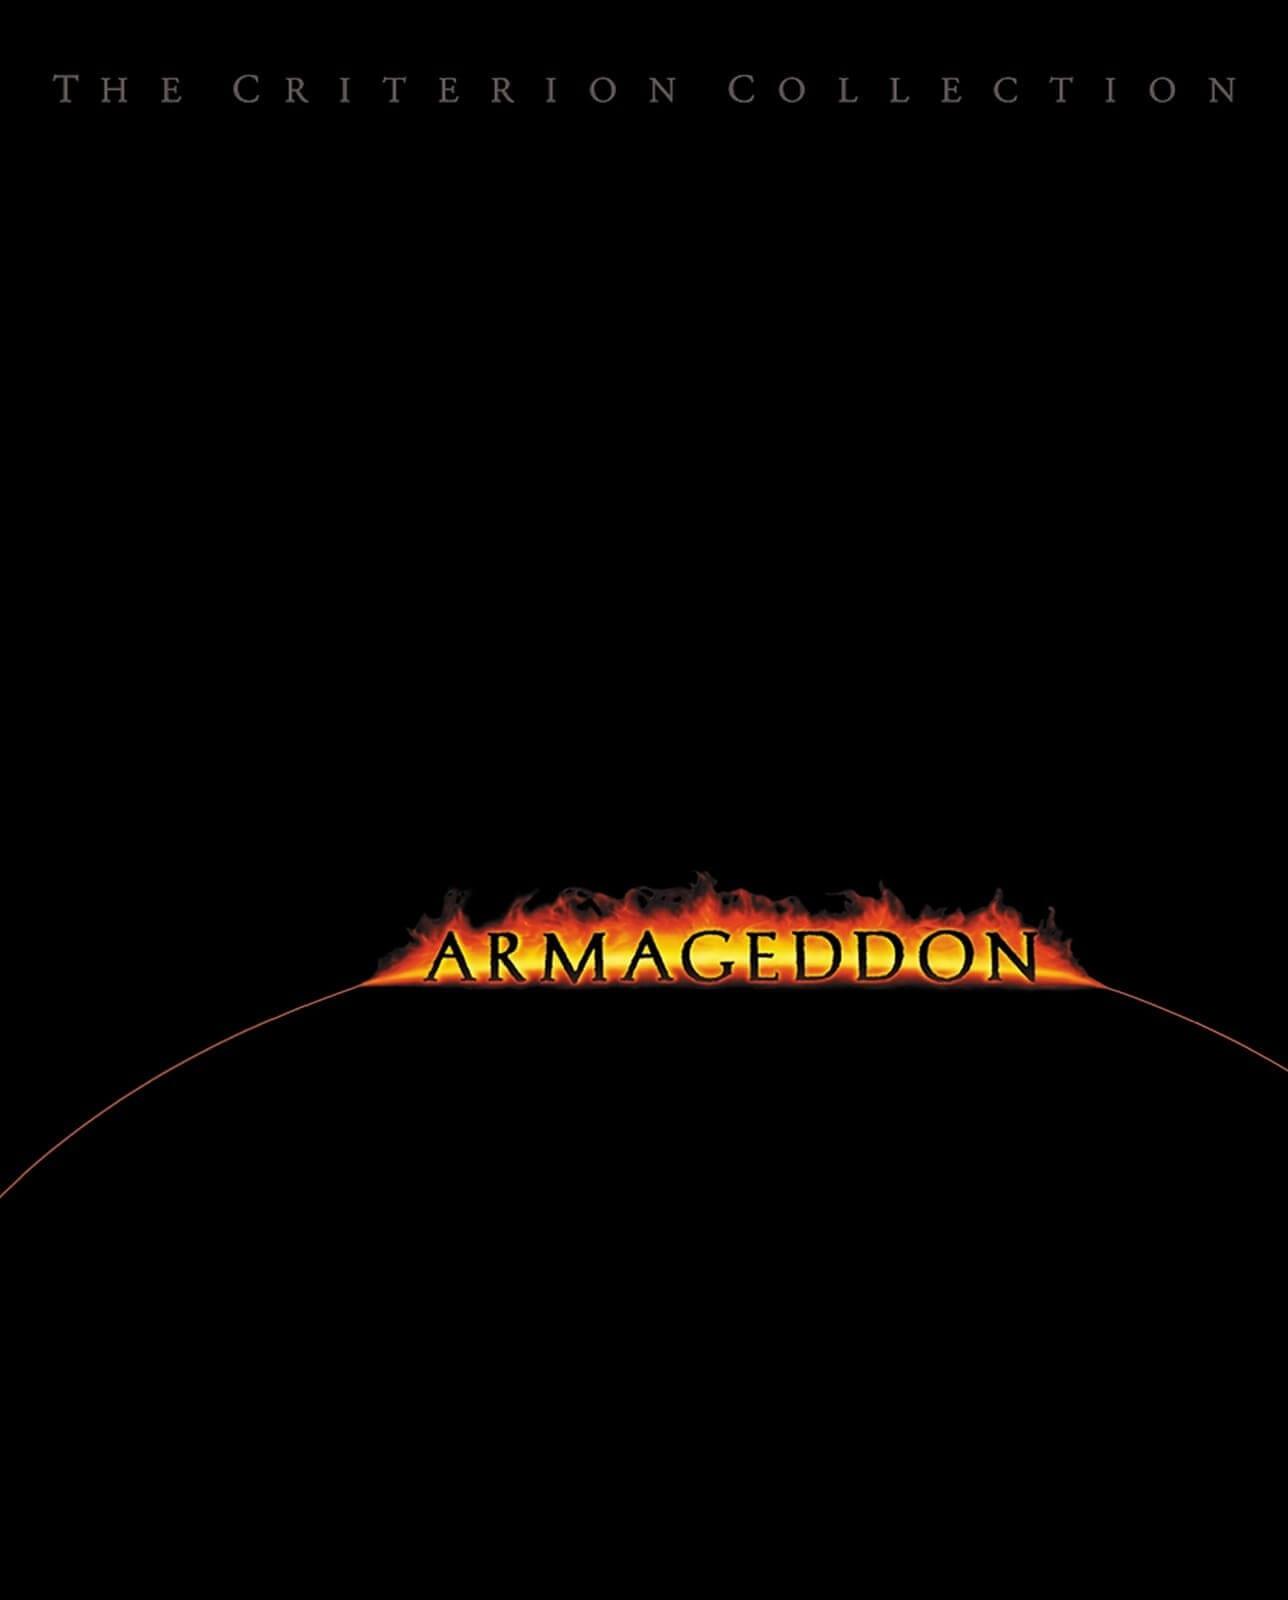 Armageddon movie cover